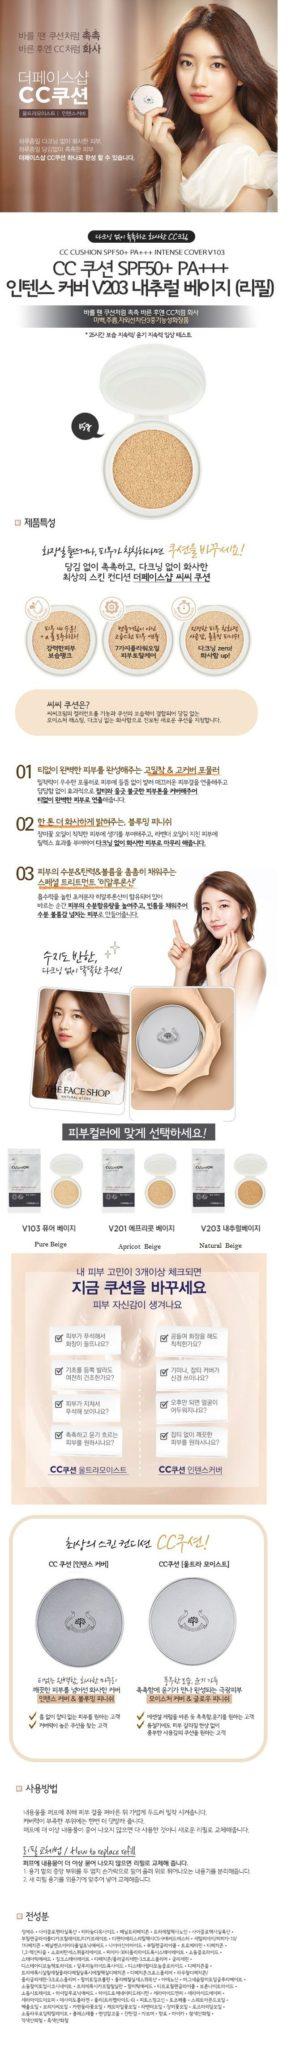 The Face Shop CC Intense Cover Cushion SPF 50+ PA+++ 15g [refill]